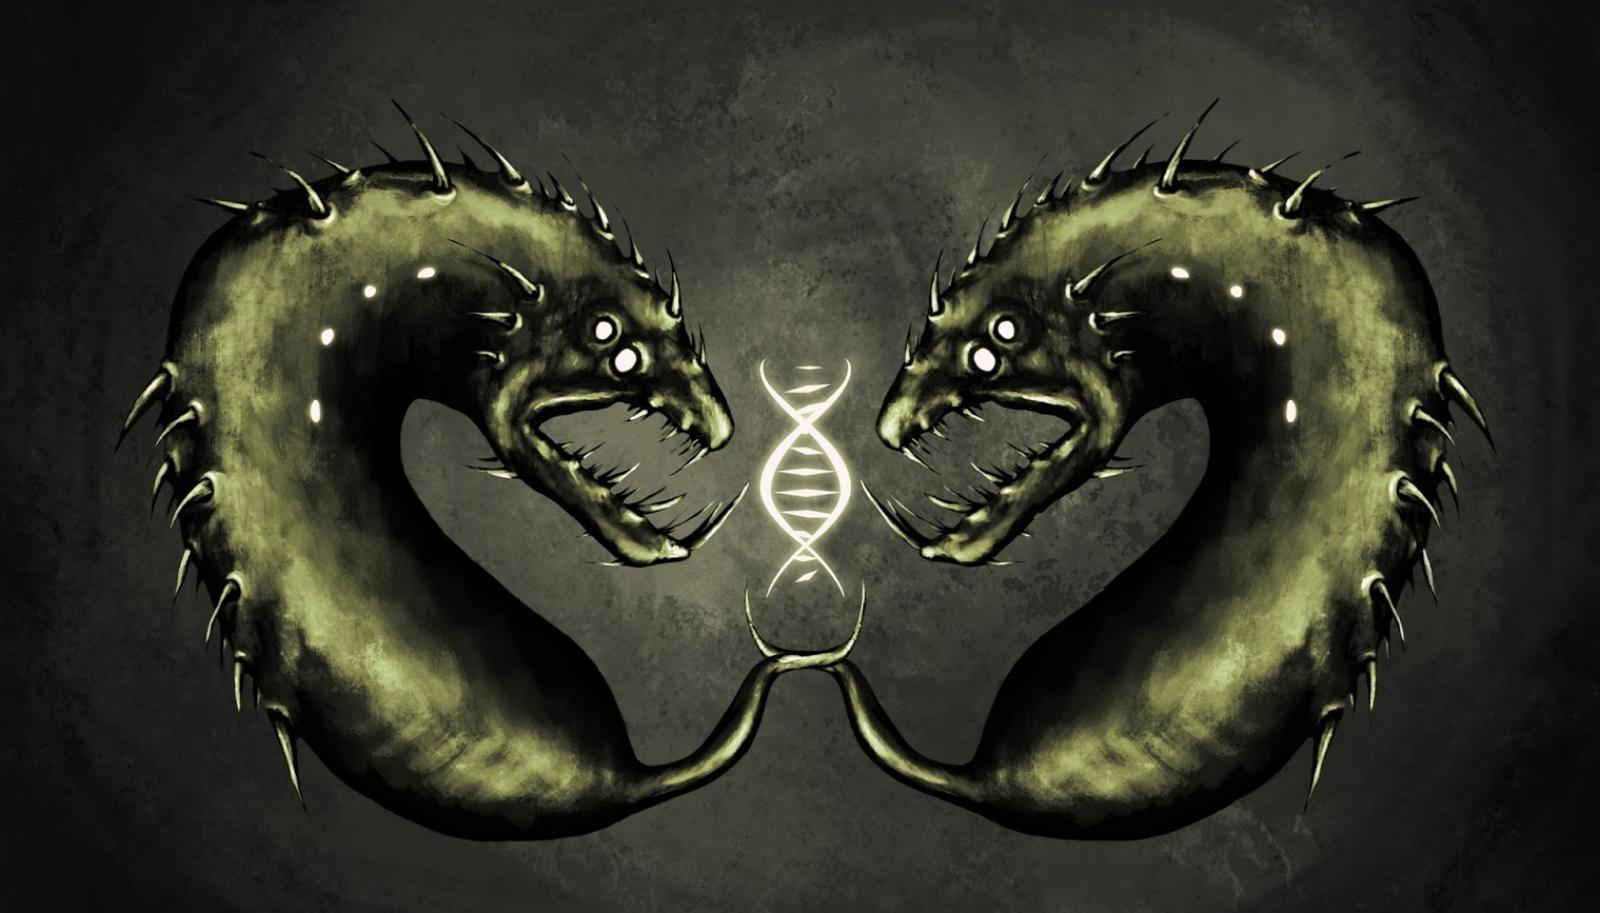 Leviathan - Bacteria